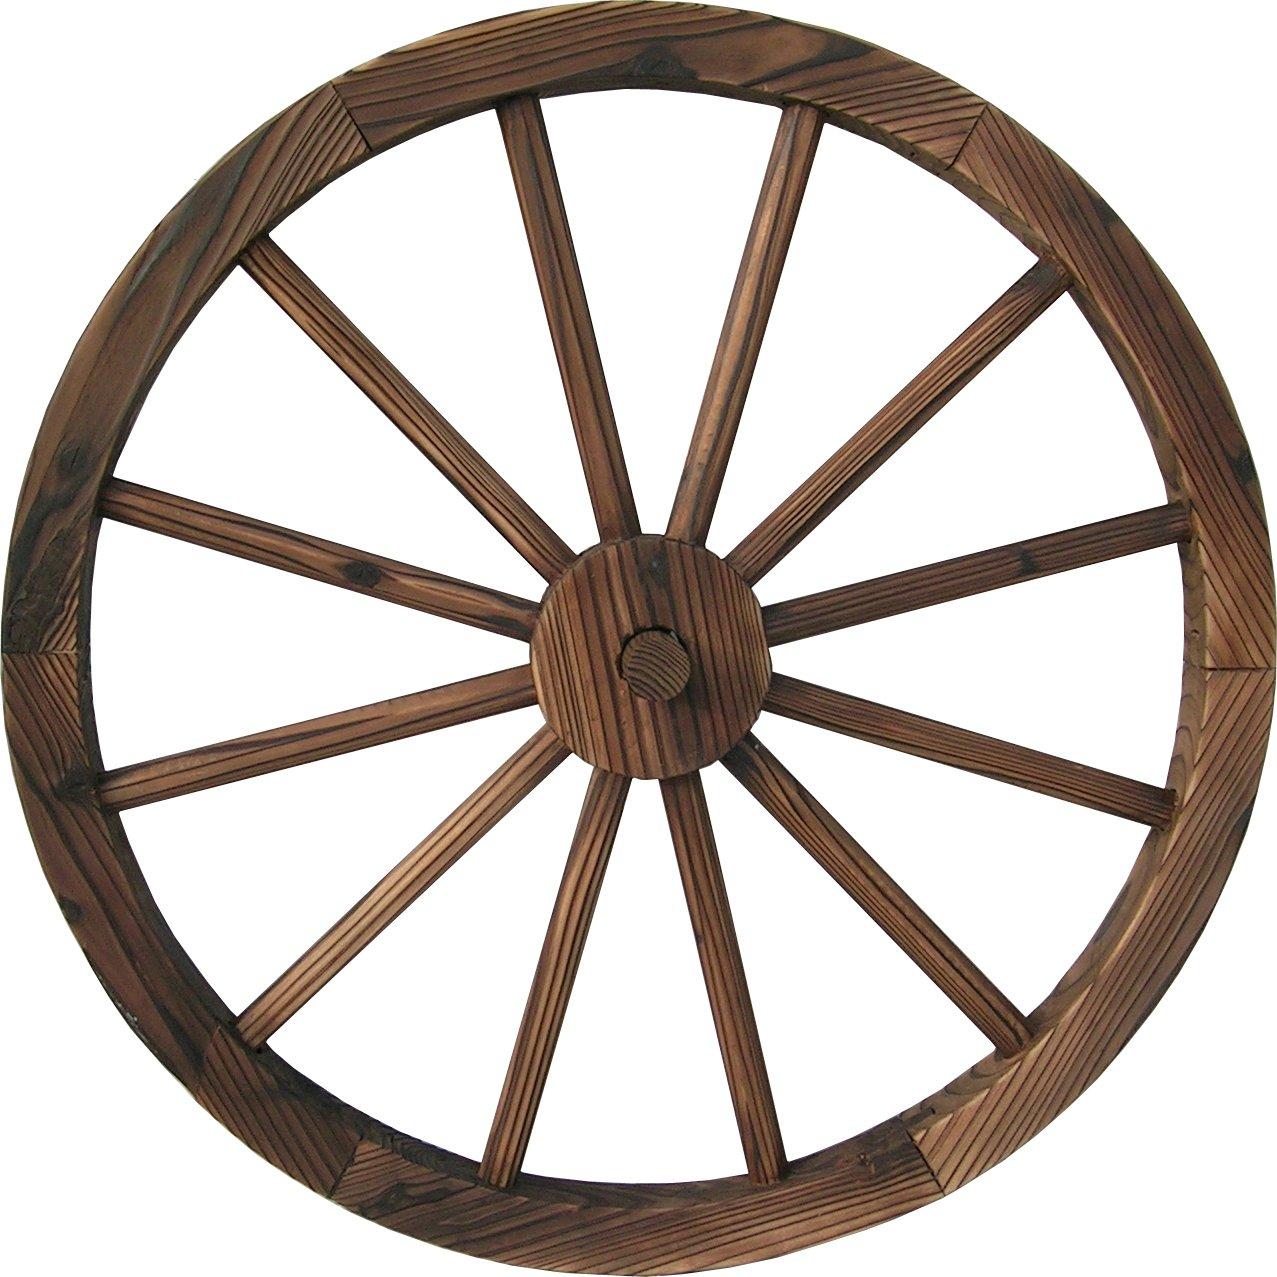 DDI QD-LFNB-W30W 30'' Wooden Wagon Wheel Burnt Wood